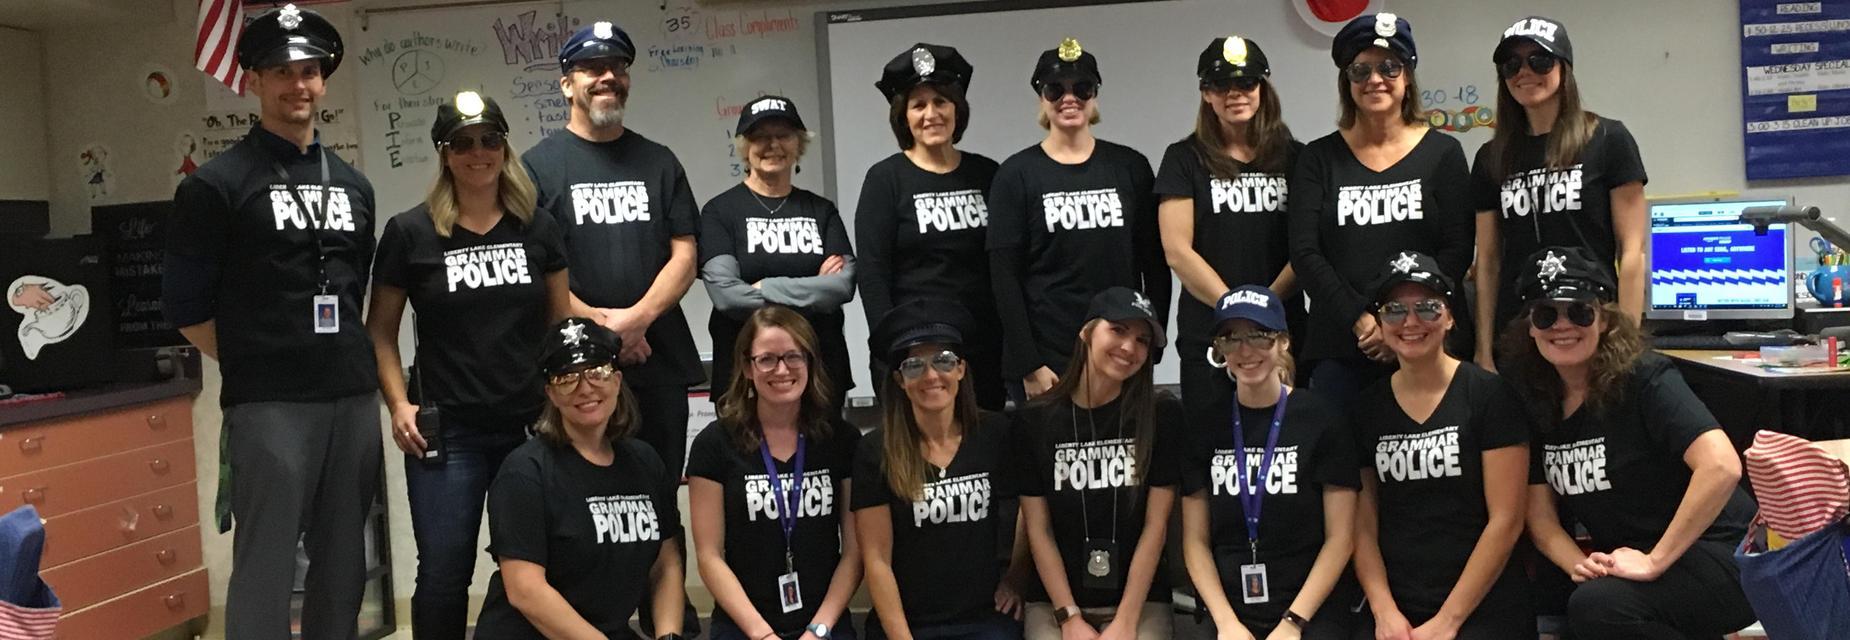 The Grammar Police- Halloween